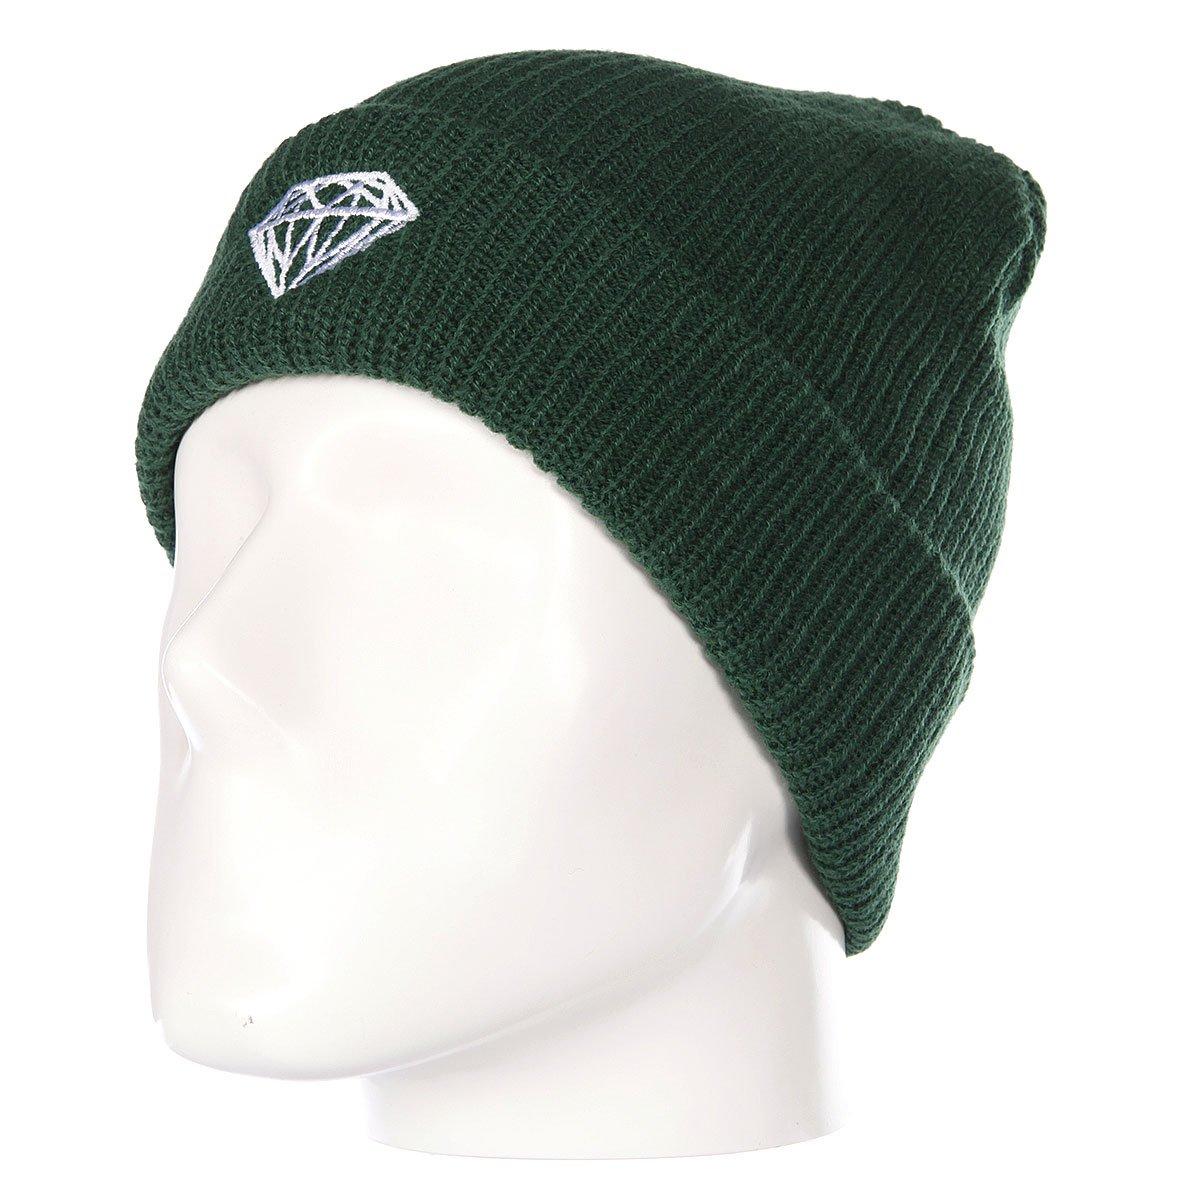 7f775ef5940 Купить шапку Diamond Brilliant Fold Beanie Green в интернет-магазине  Proskater.by